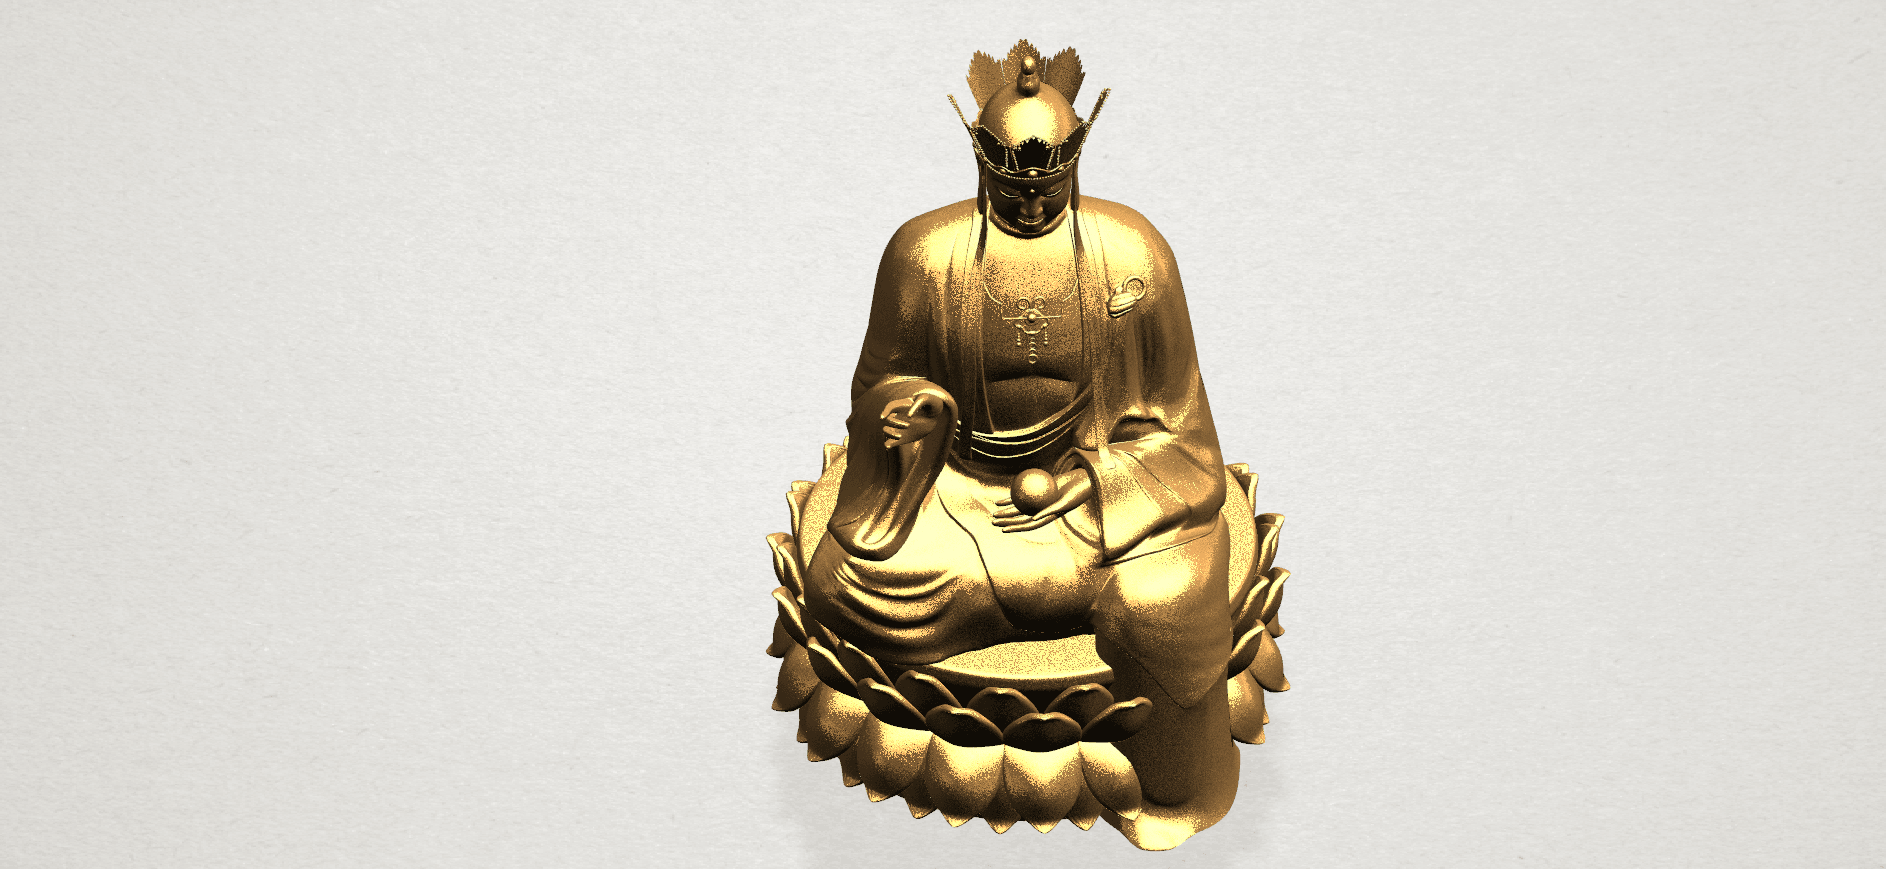 Tang Monk Xuan Zang A09.png Télécharger fichier STL gratuit Tang Monk Xuan Zang Zang • Plan à imprimer en 3D, GeorgesNikkei